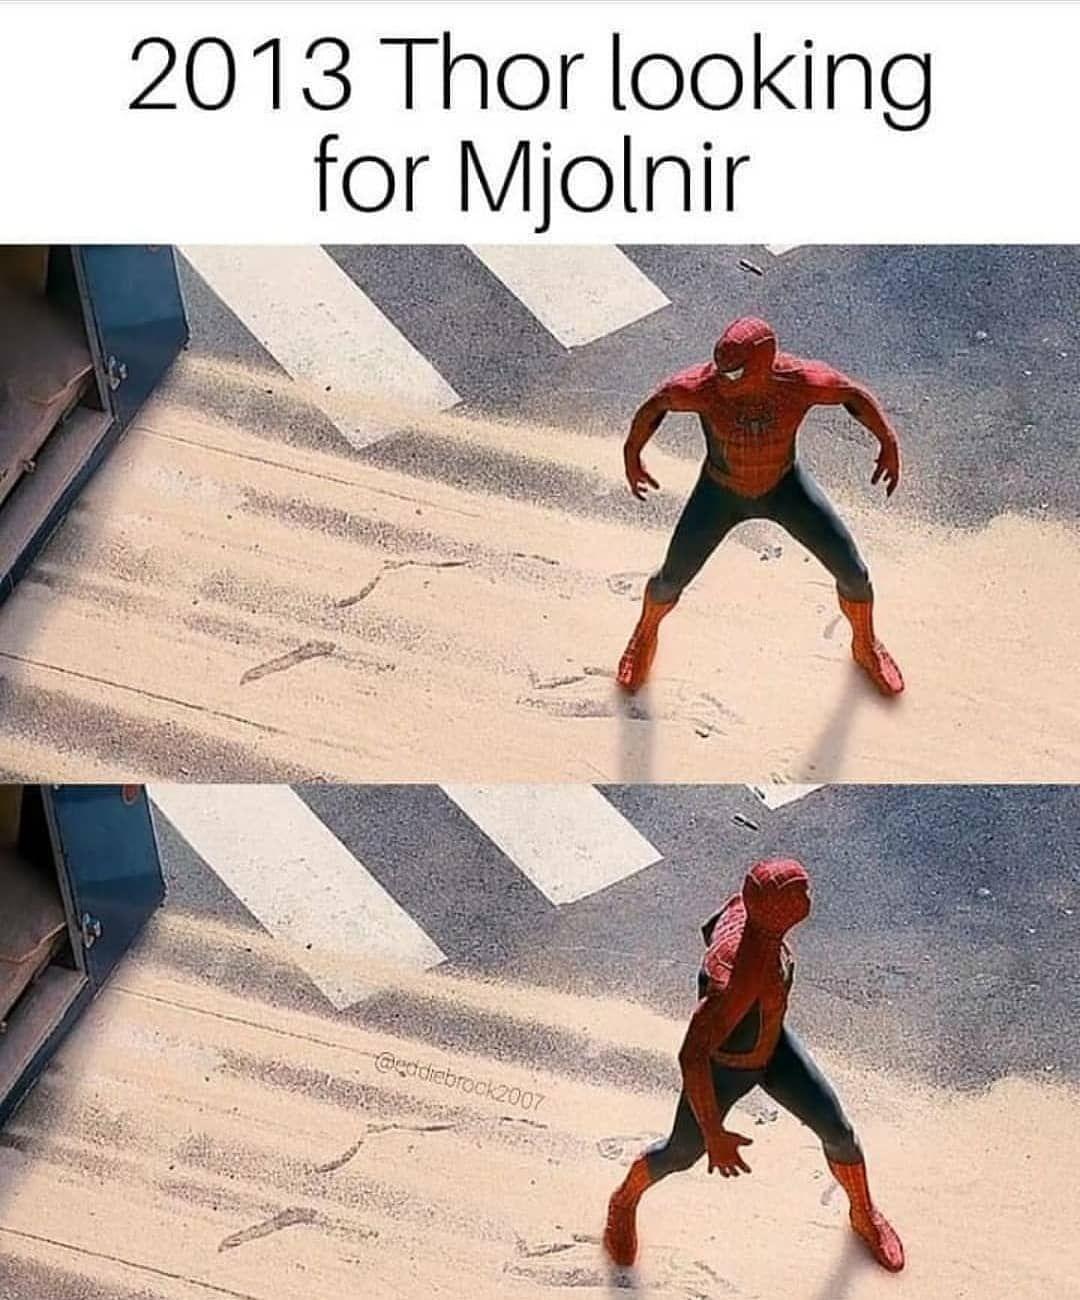 I M Still Worthy Memes Meme Memesdaily Dailymemes Pewdiepie Minecraft Is Superior Funny Funnymemes Jamescharles Memerevi Thor Memes Avengers Memes